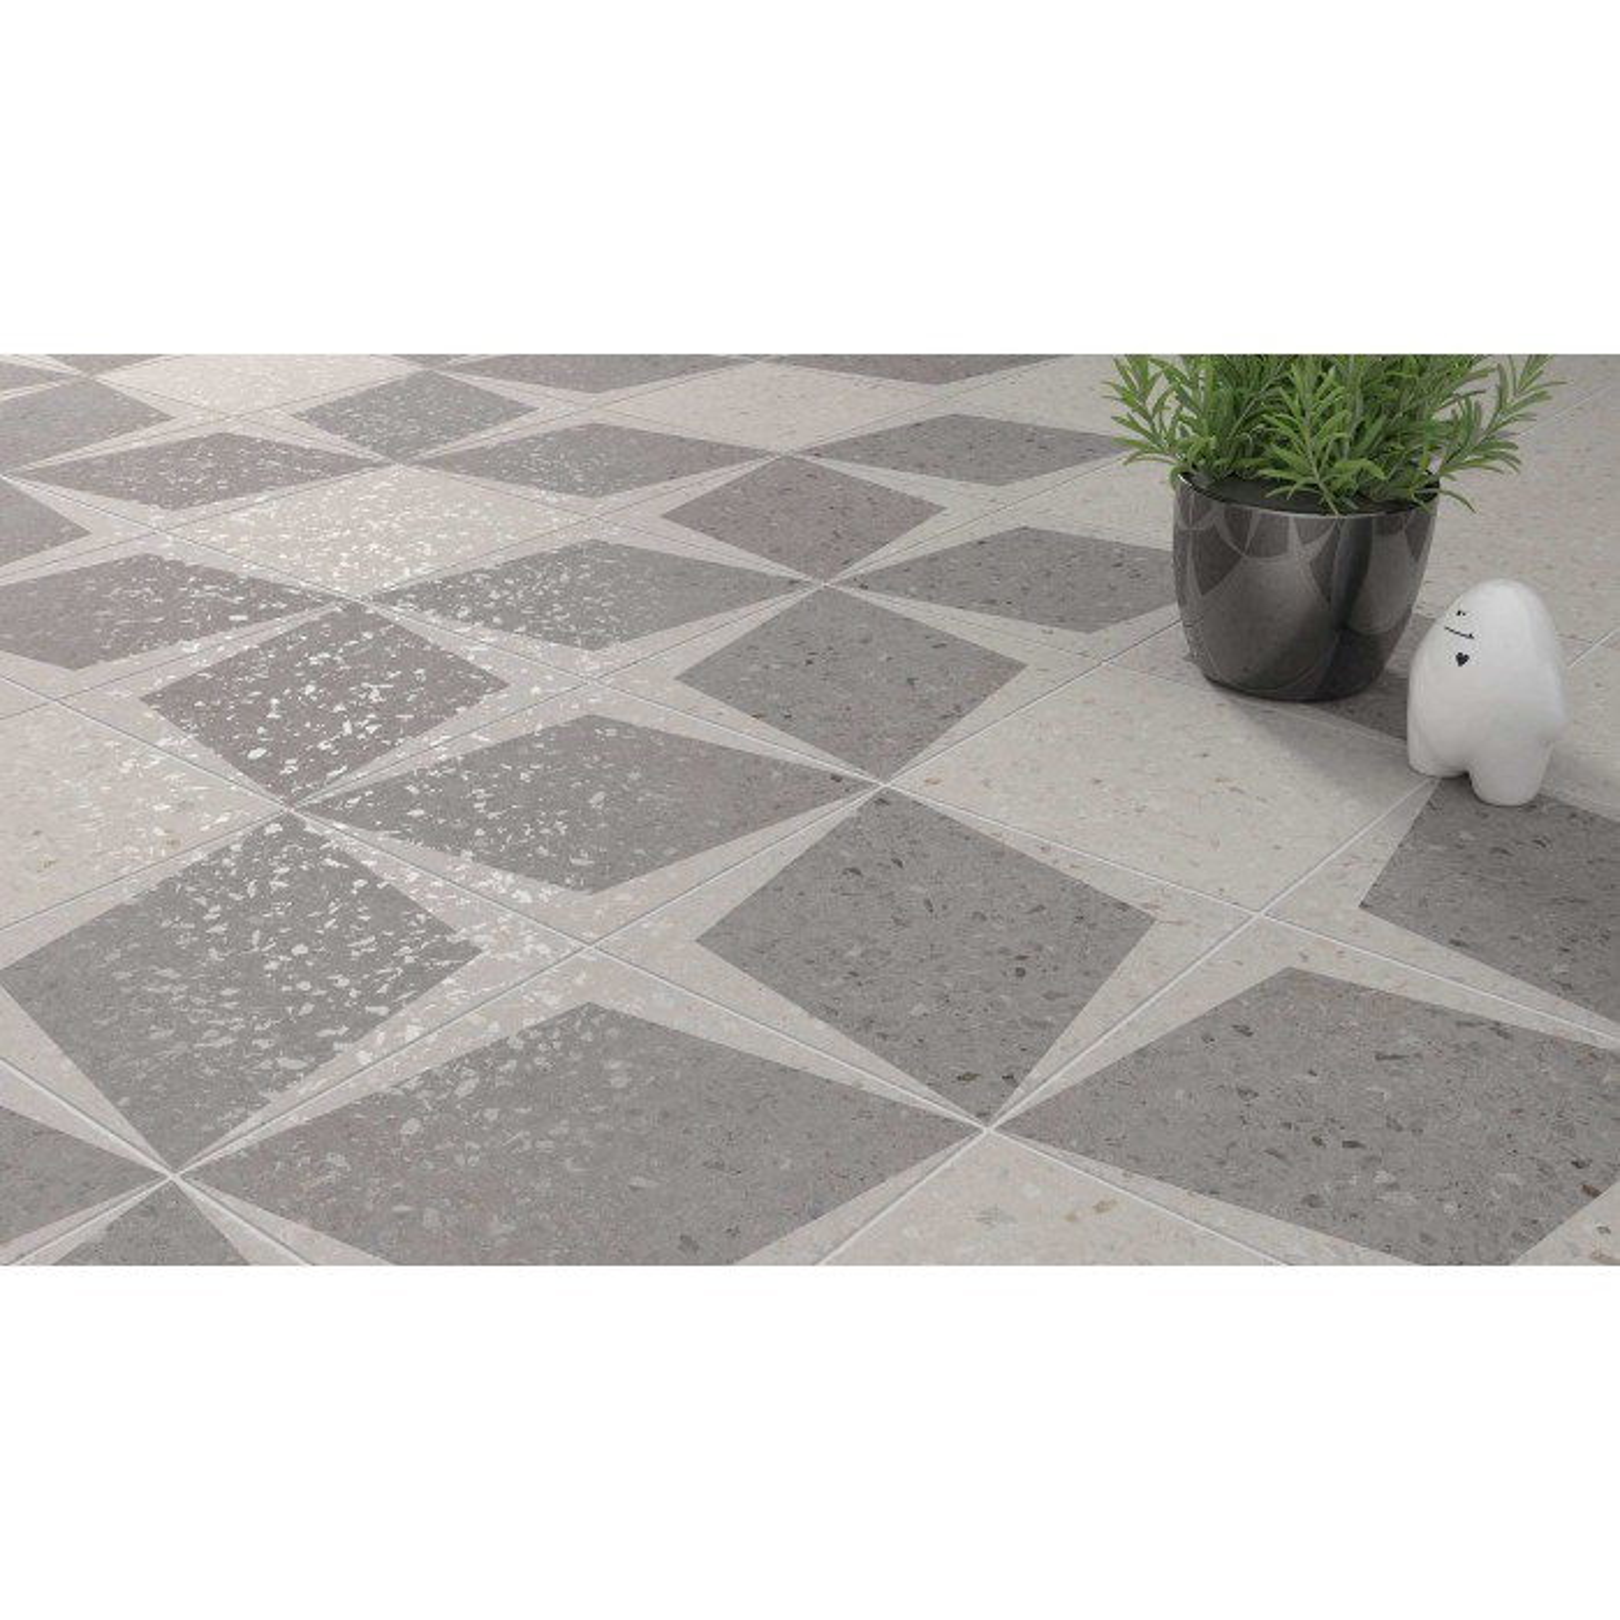 Carrelage gr s c rame effet terrazzo drops rhombus decor for Carrelage terrazzo